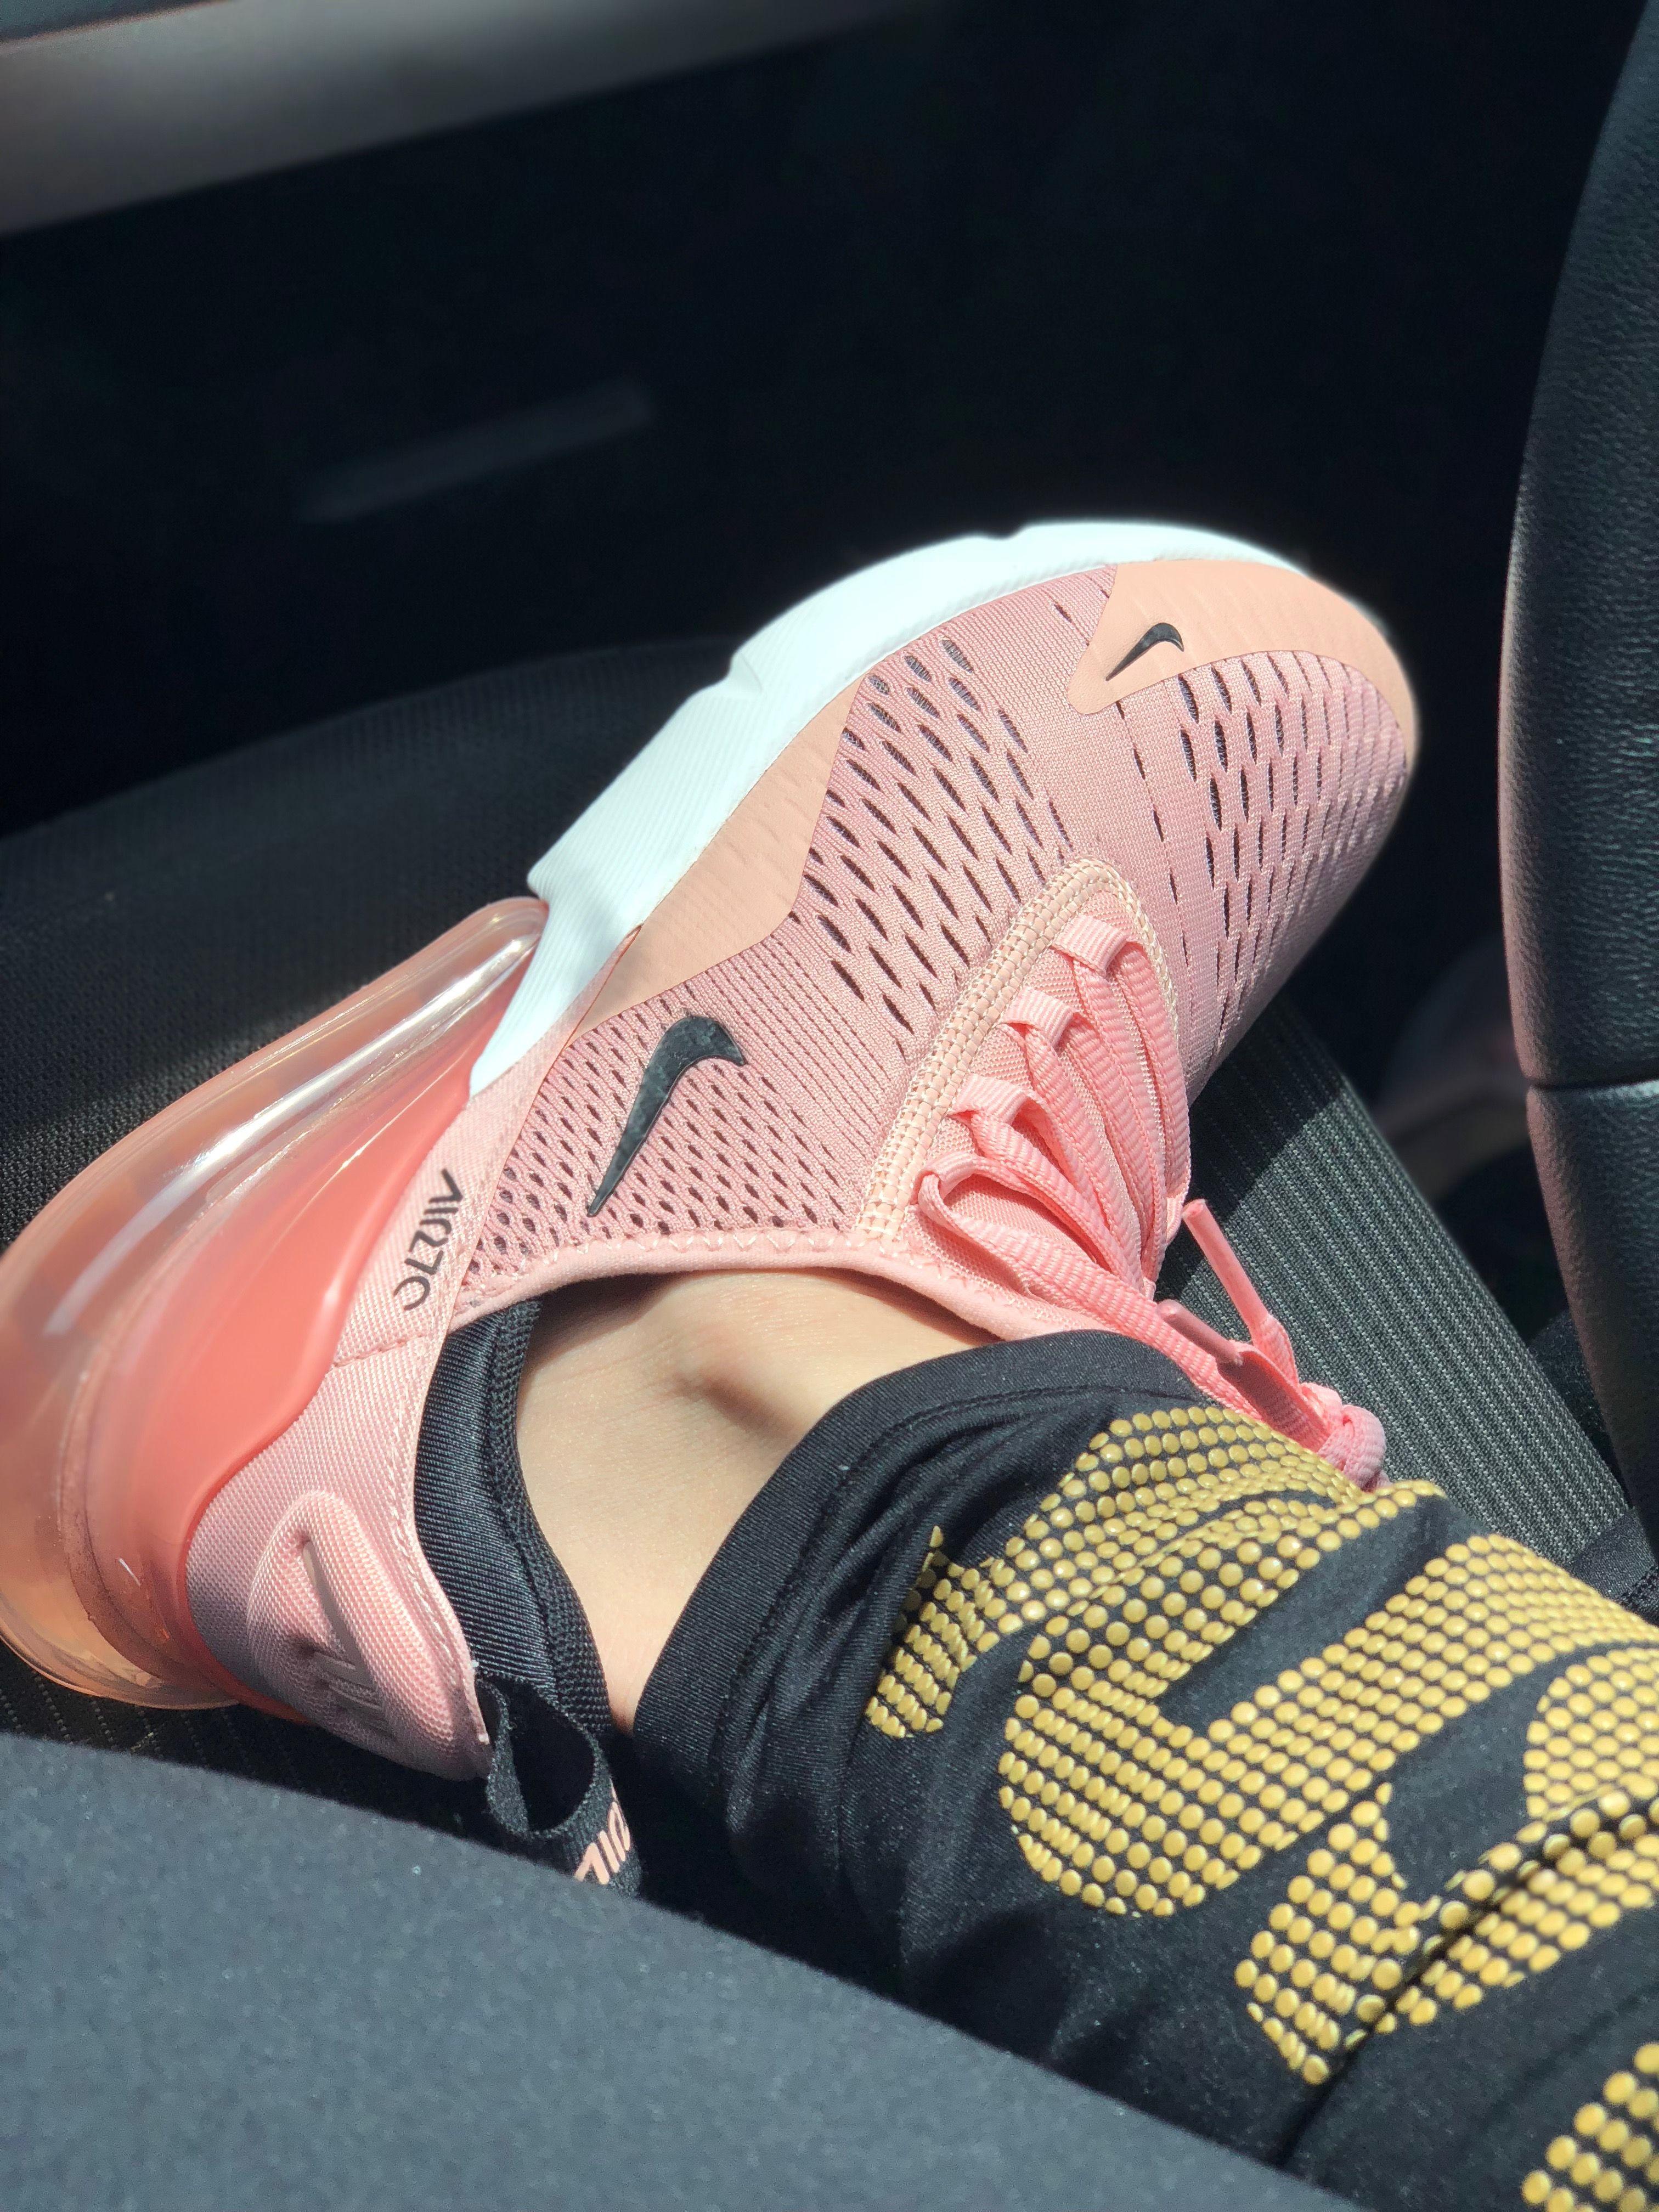 7c42814502a76 Nike Airmax 270 pink